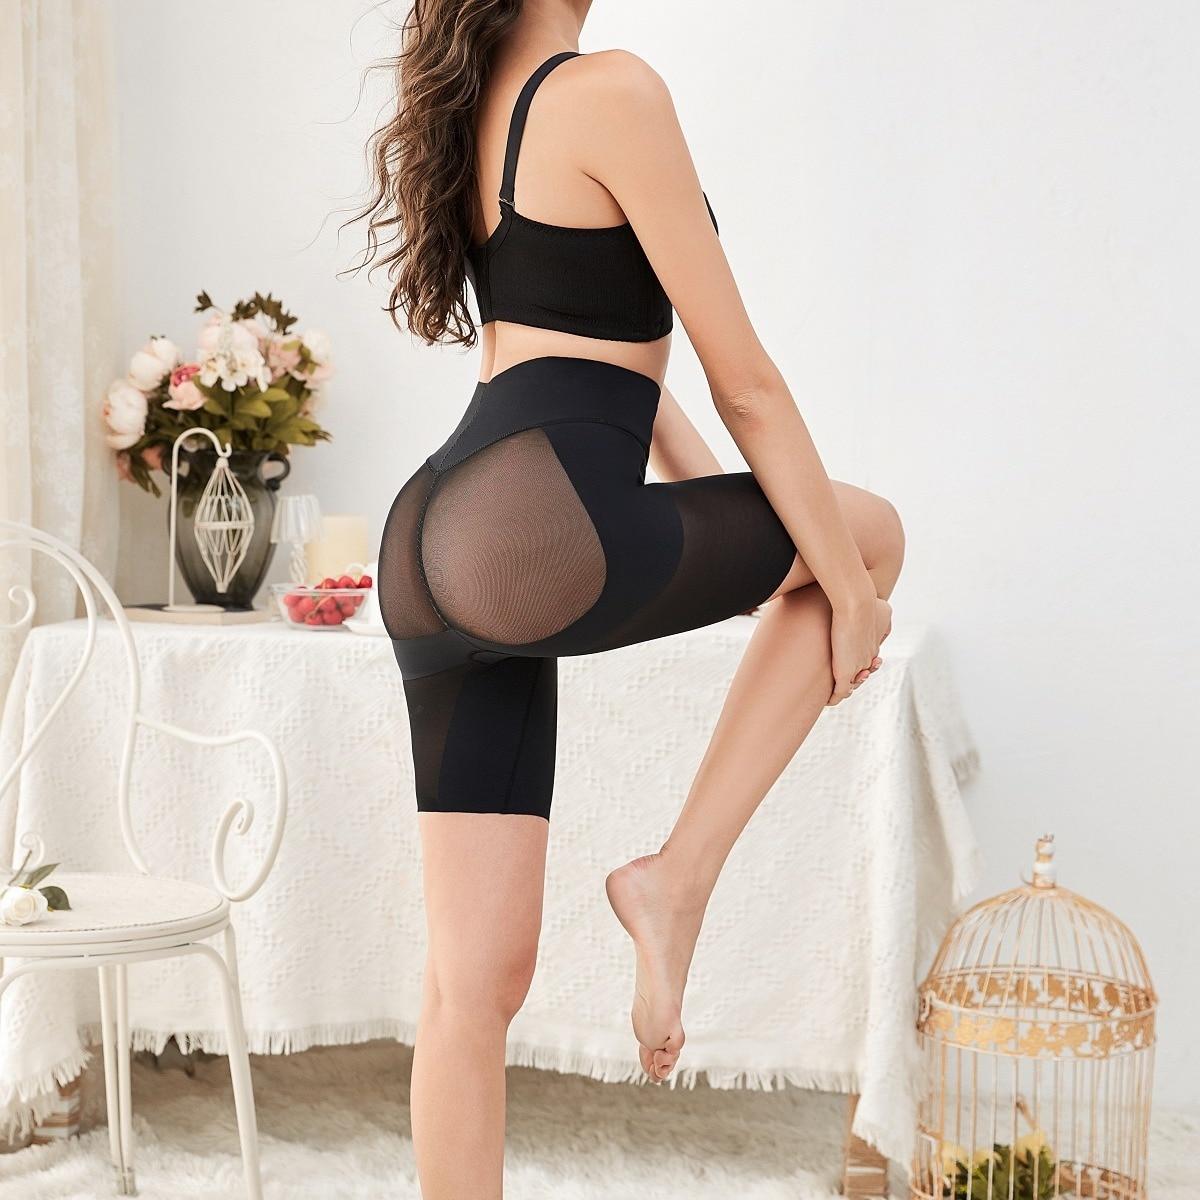 Best Shapers For Women 30Pcs/Lot Graphene Material Bioceramics Technology Panties Slimming Tummy Control Underwear